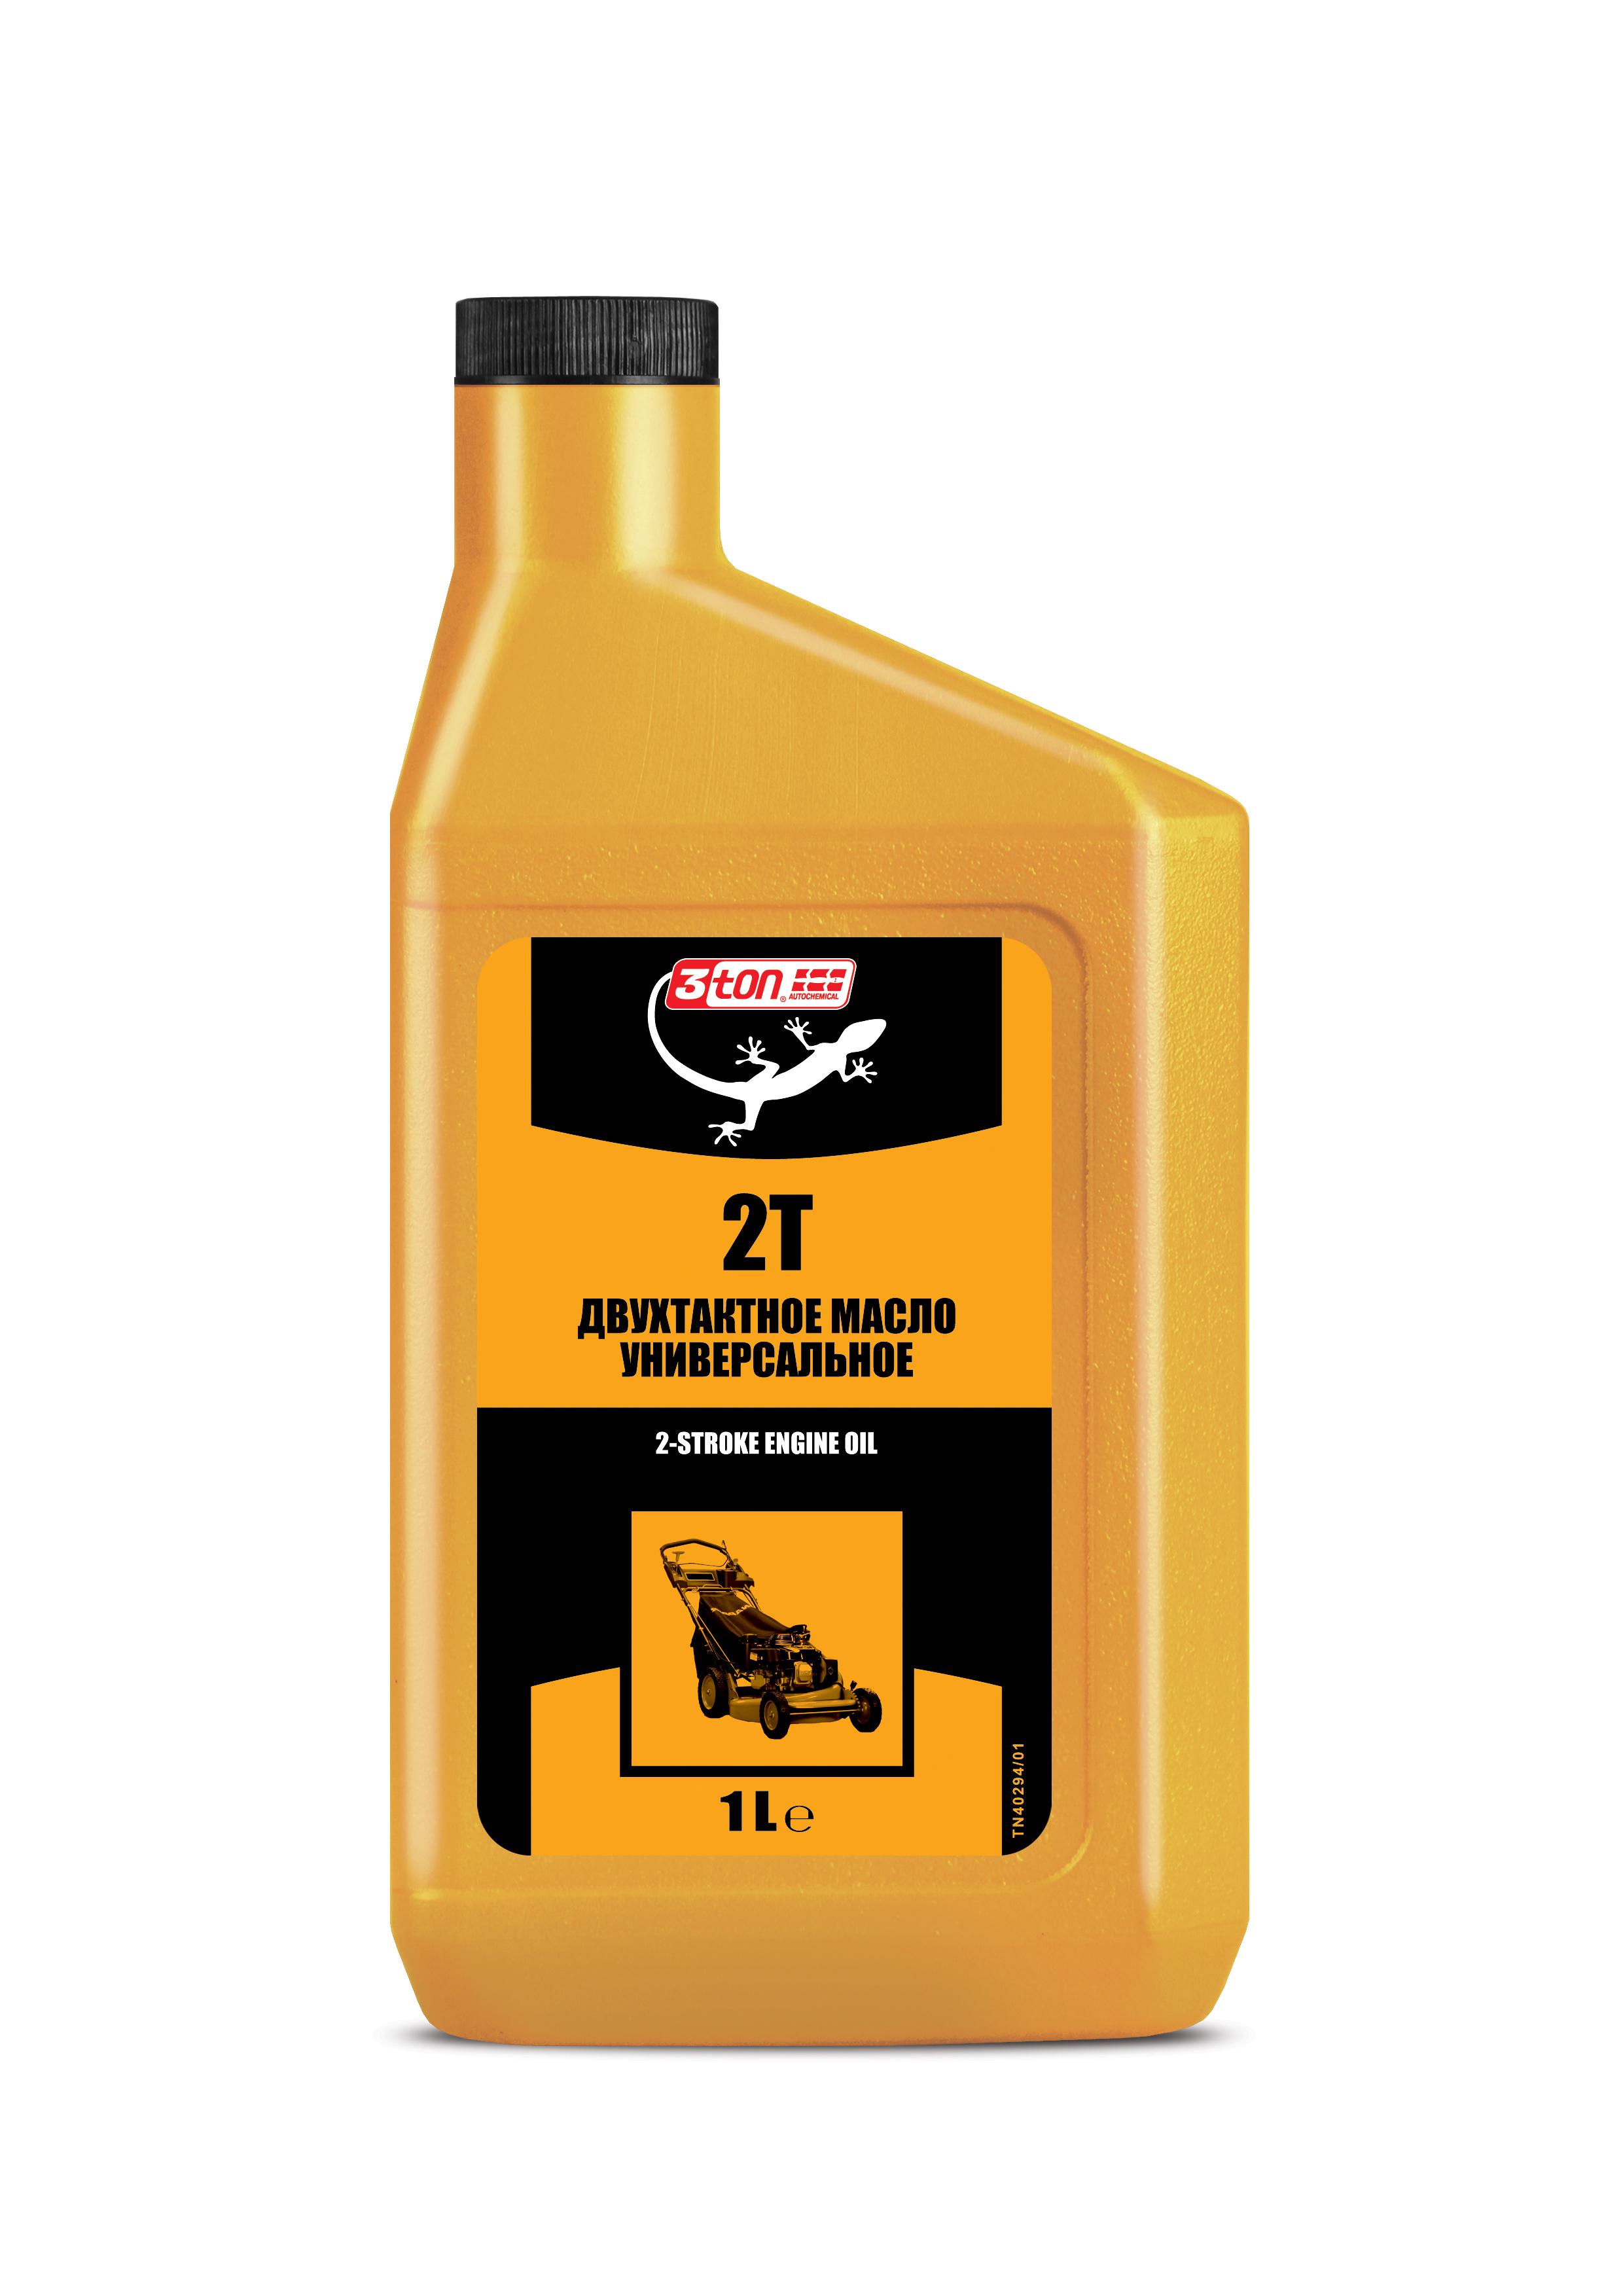 Моторное масло для 2-такт 3ton universal 2t (1л)